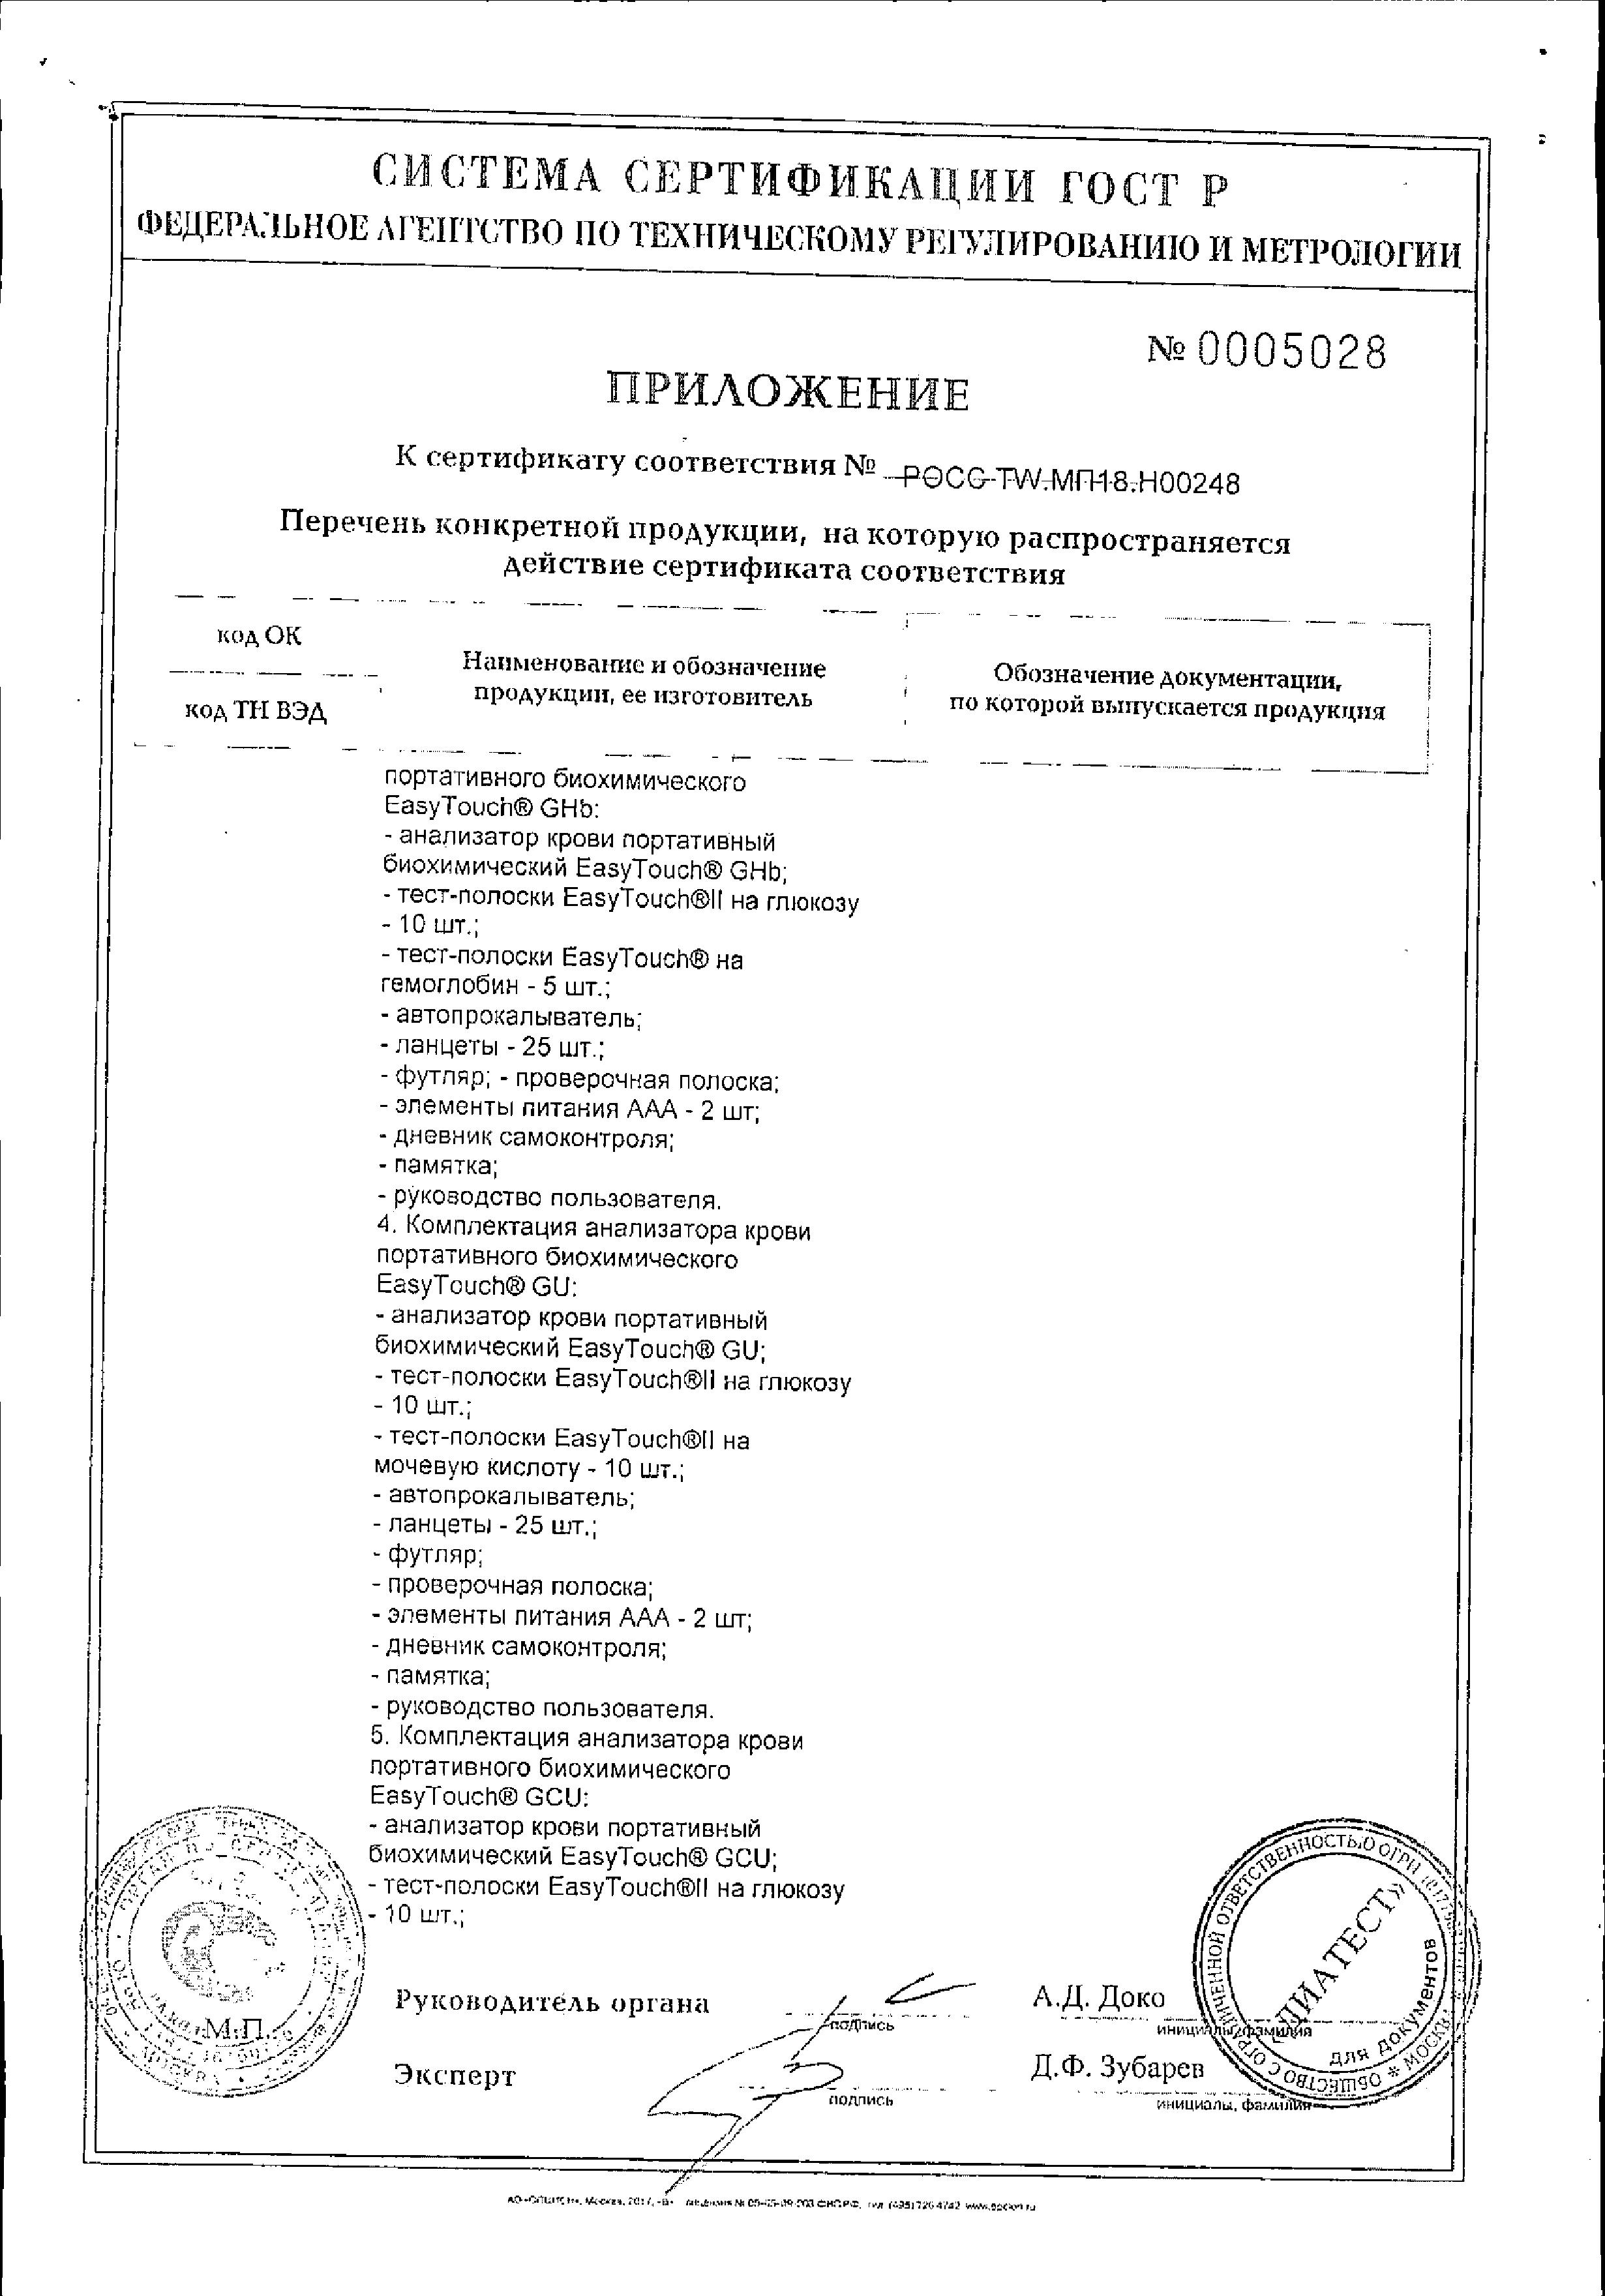 EasyTouch GС Анализатор крови биохимический глюкоза-холестерин сертификат